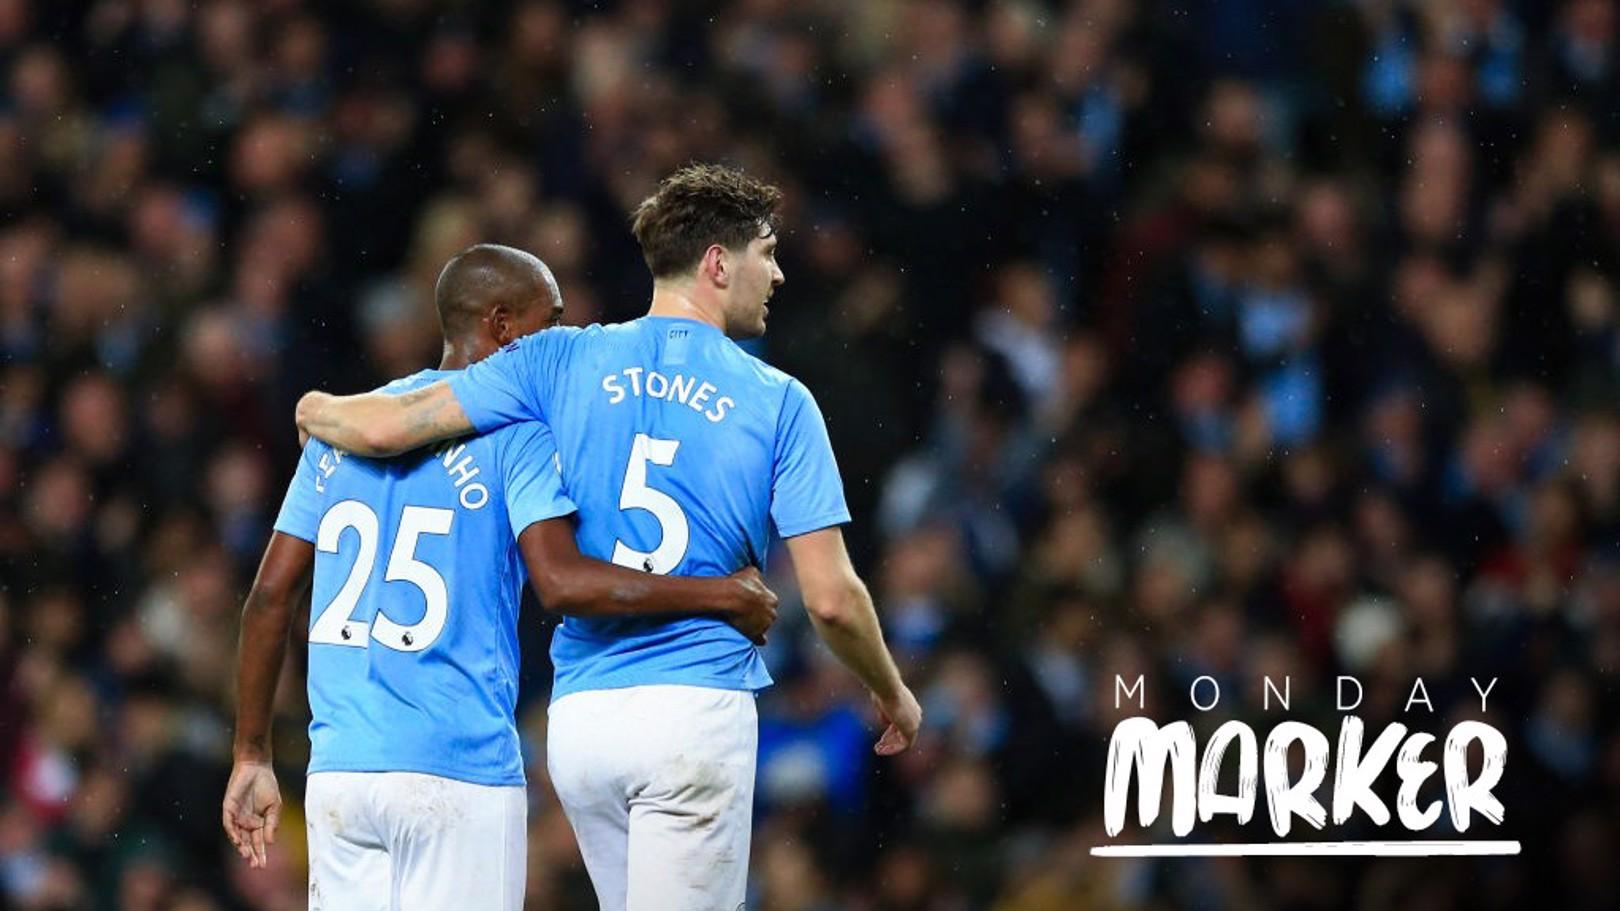 UPCOMING: A busy week beckons at Manchester City.